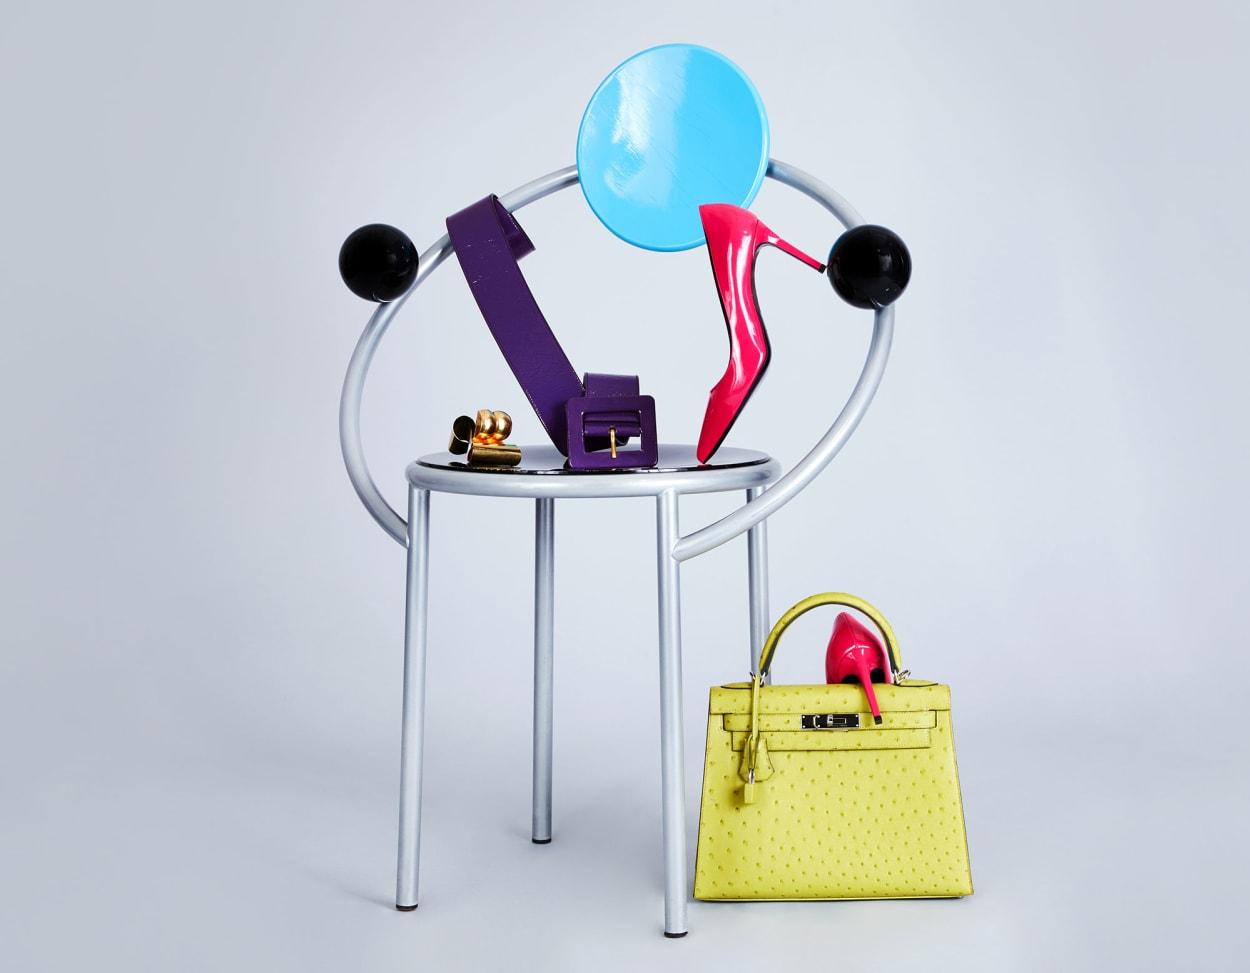 Vestiaire Collective, Mode, Vintage, AD, Gewinnspiel